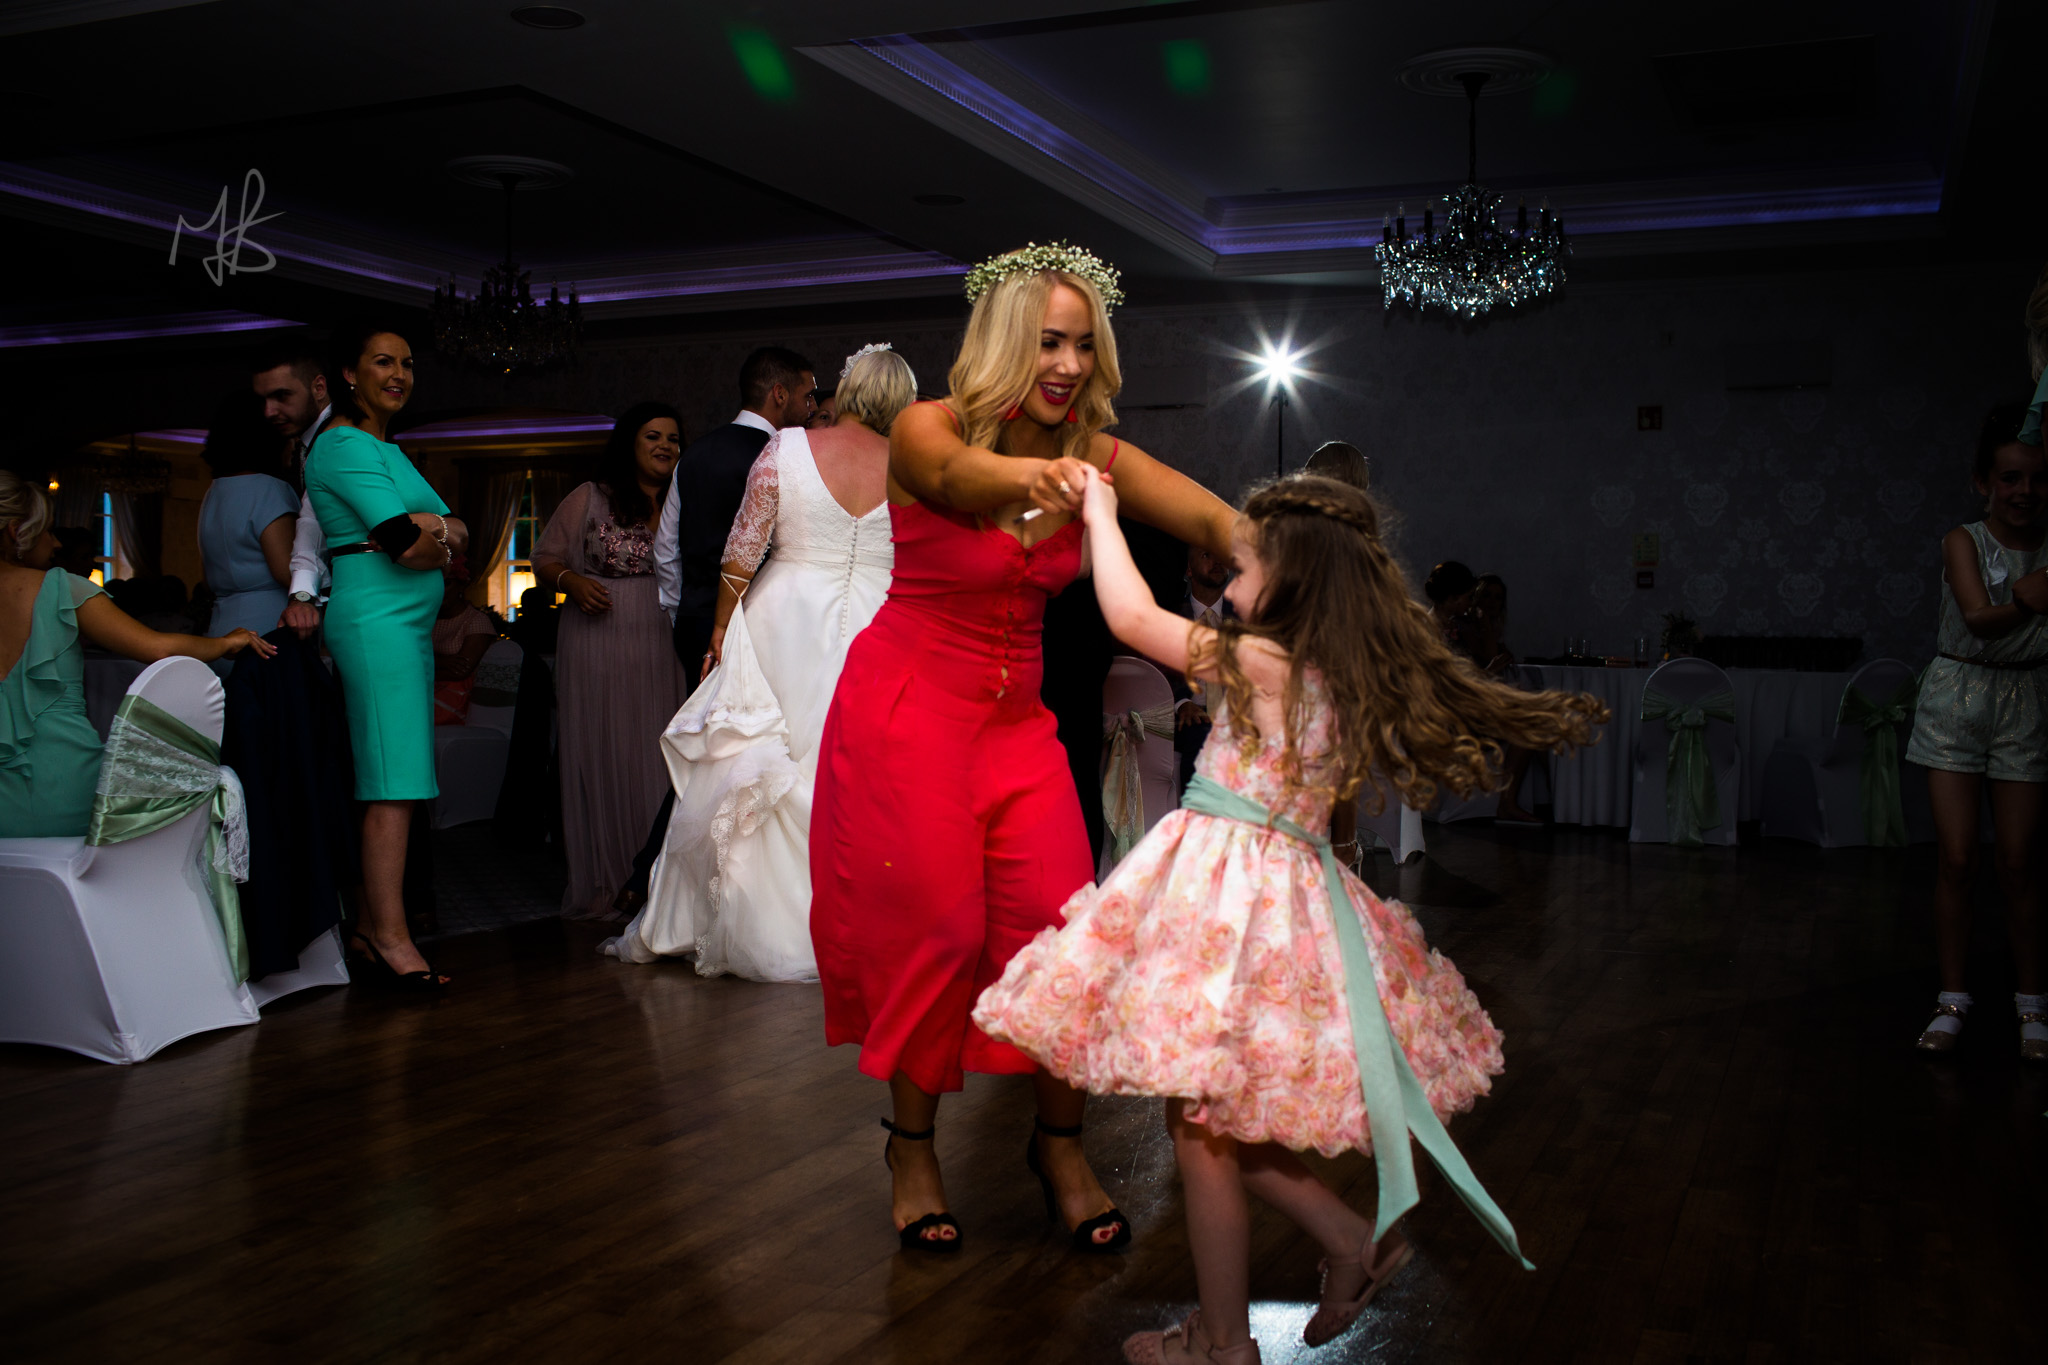 Northern-Ireland-Wedding-Photographer-Mark-Barnes-Ballymena_wedding-photography-Leighinmohr-House-Seamas_Alanna_For-web-65.jpg